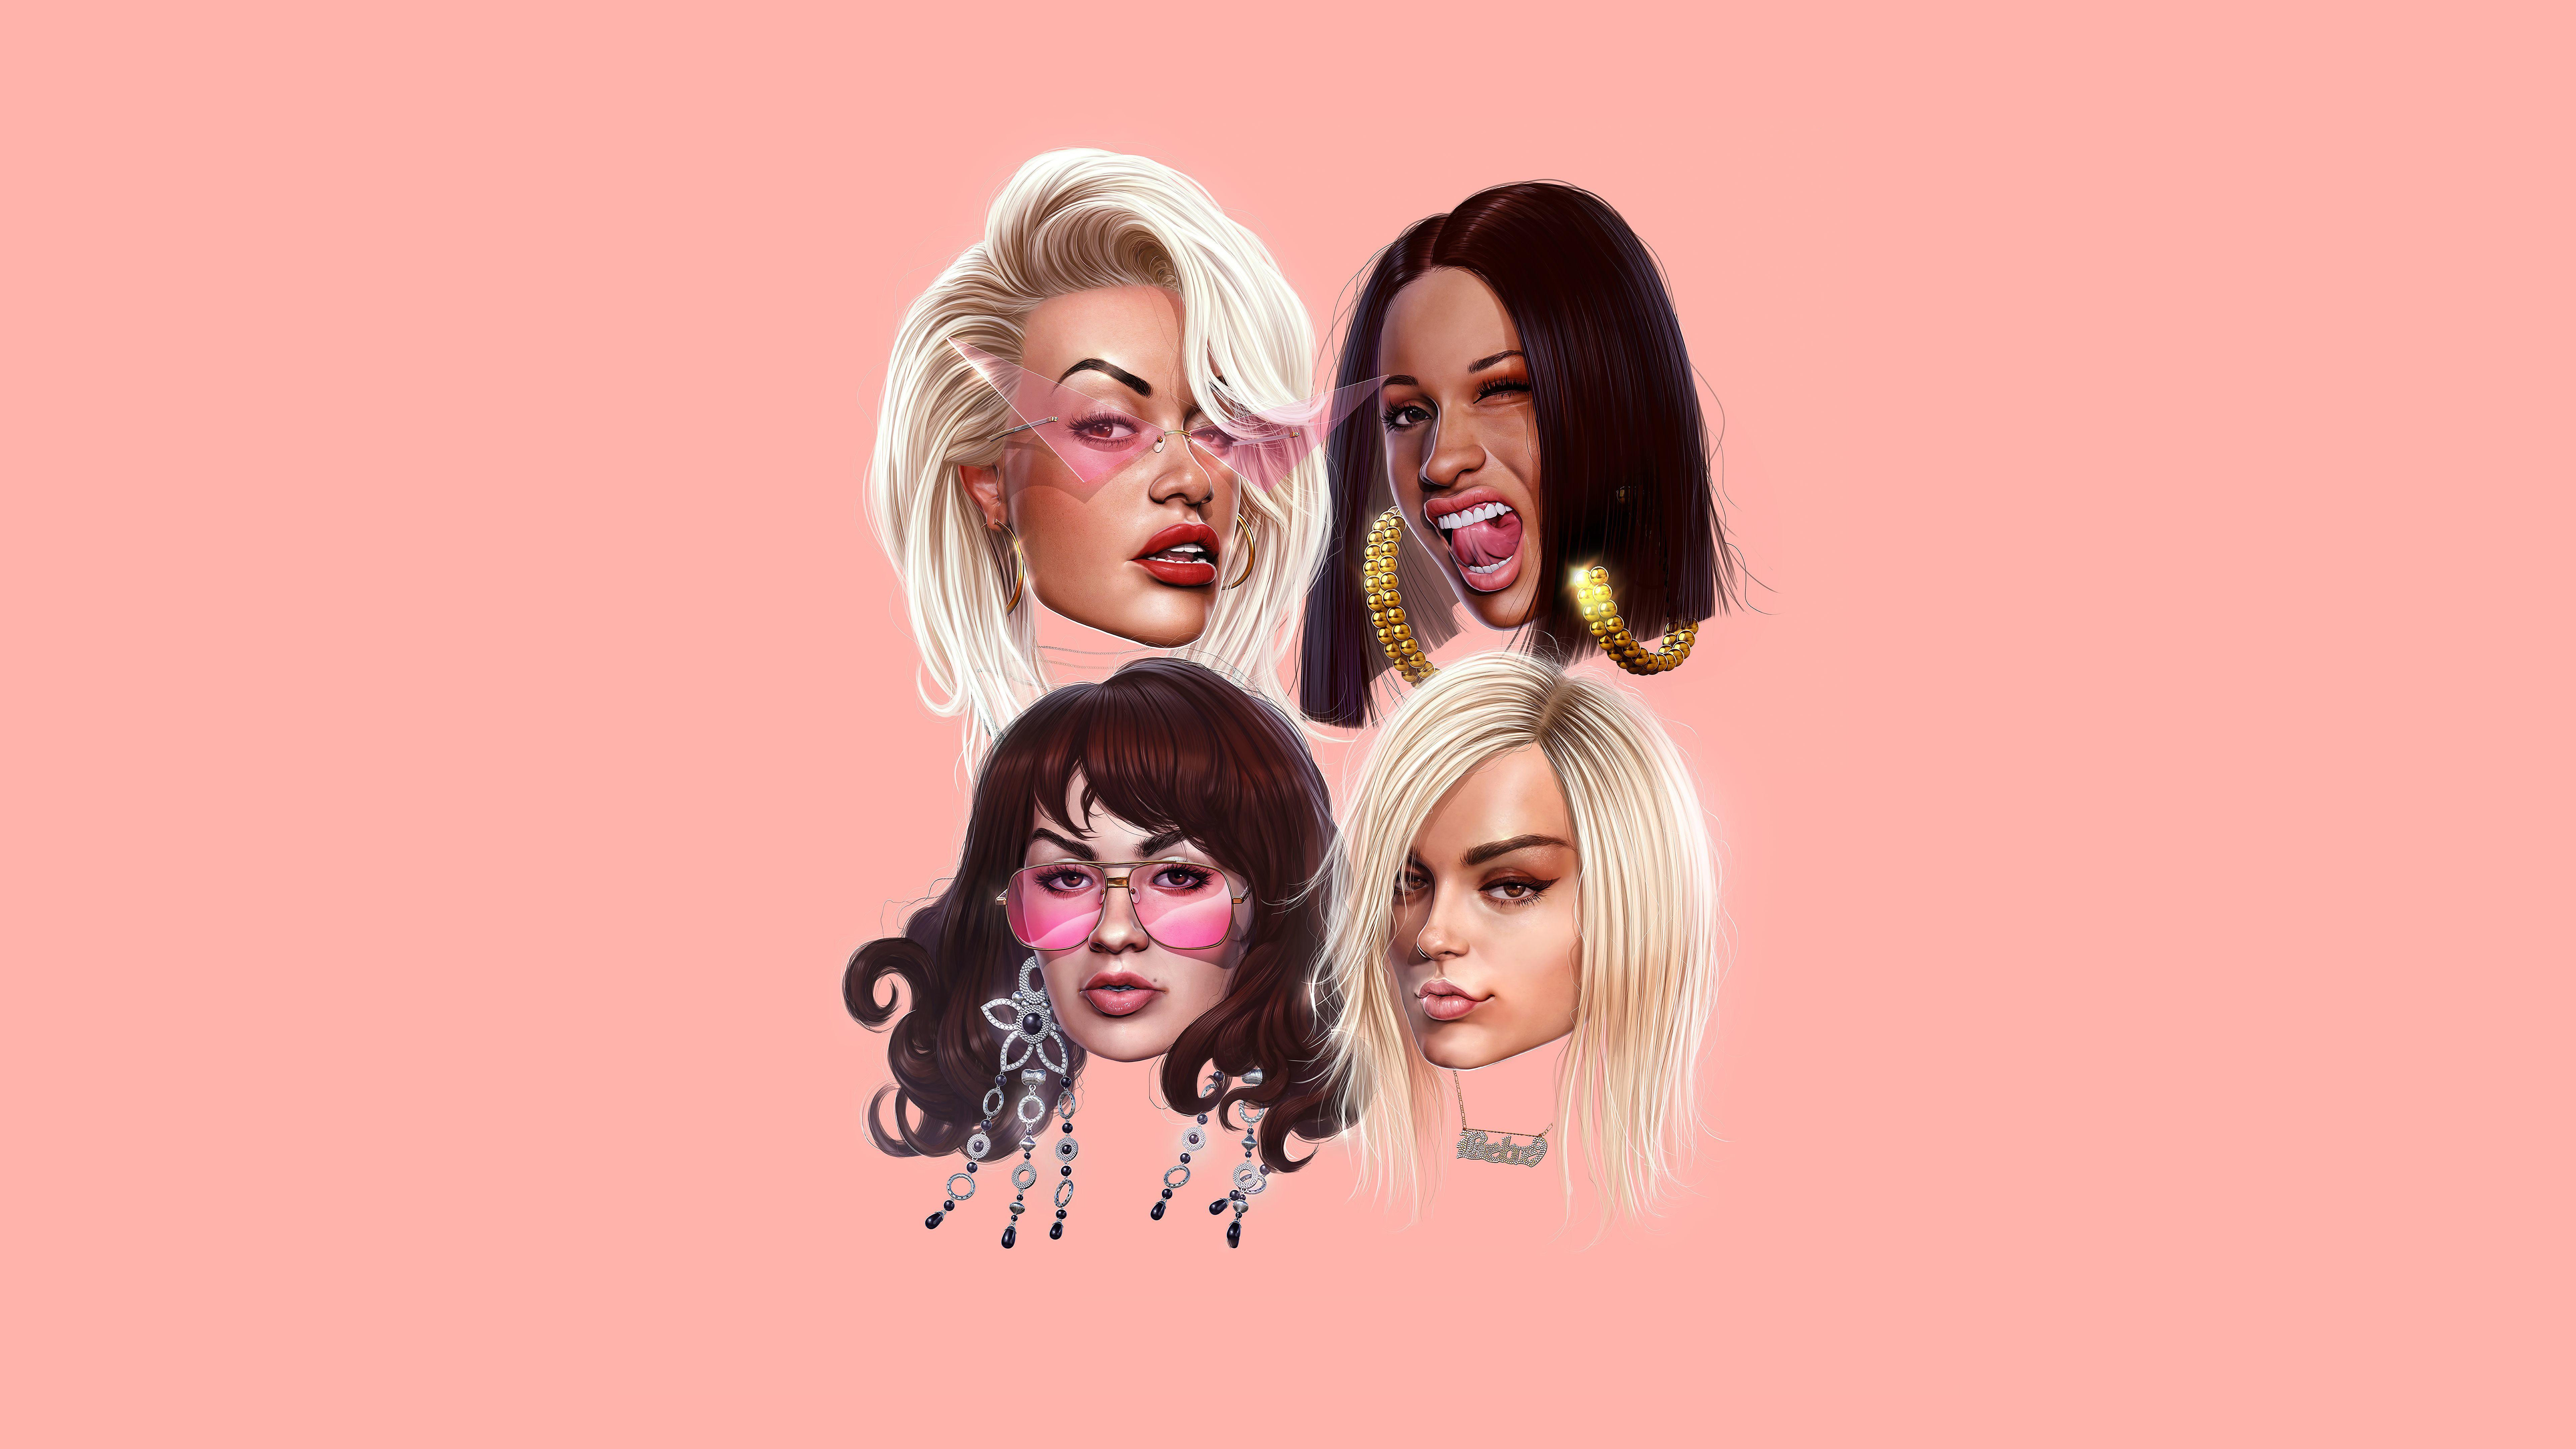 Girls Featuring Cardi B Bebe Rexha Charli Xcx Rita Ora Desktop 7680x4320